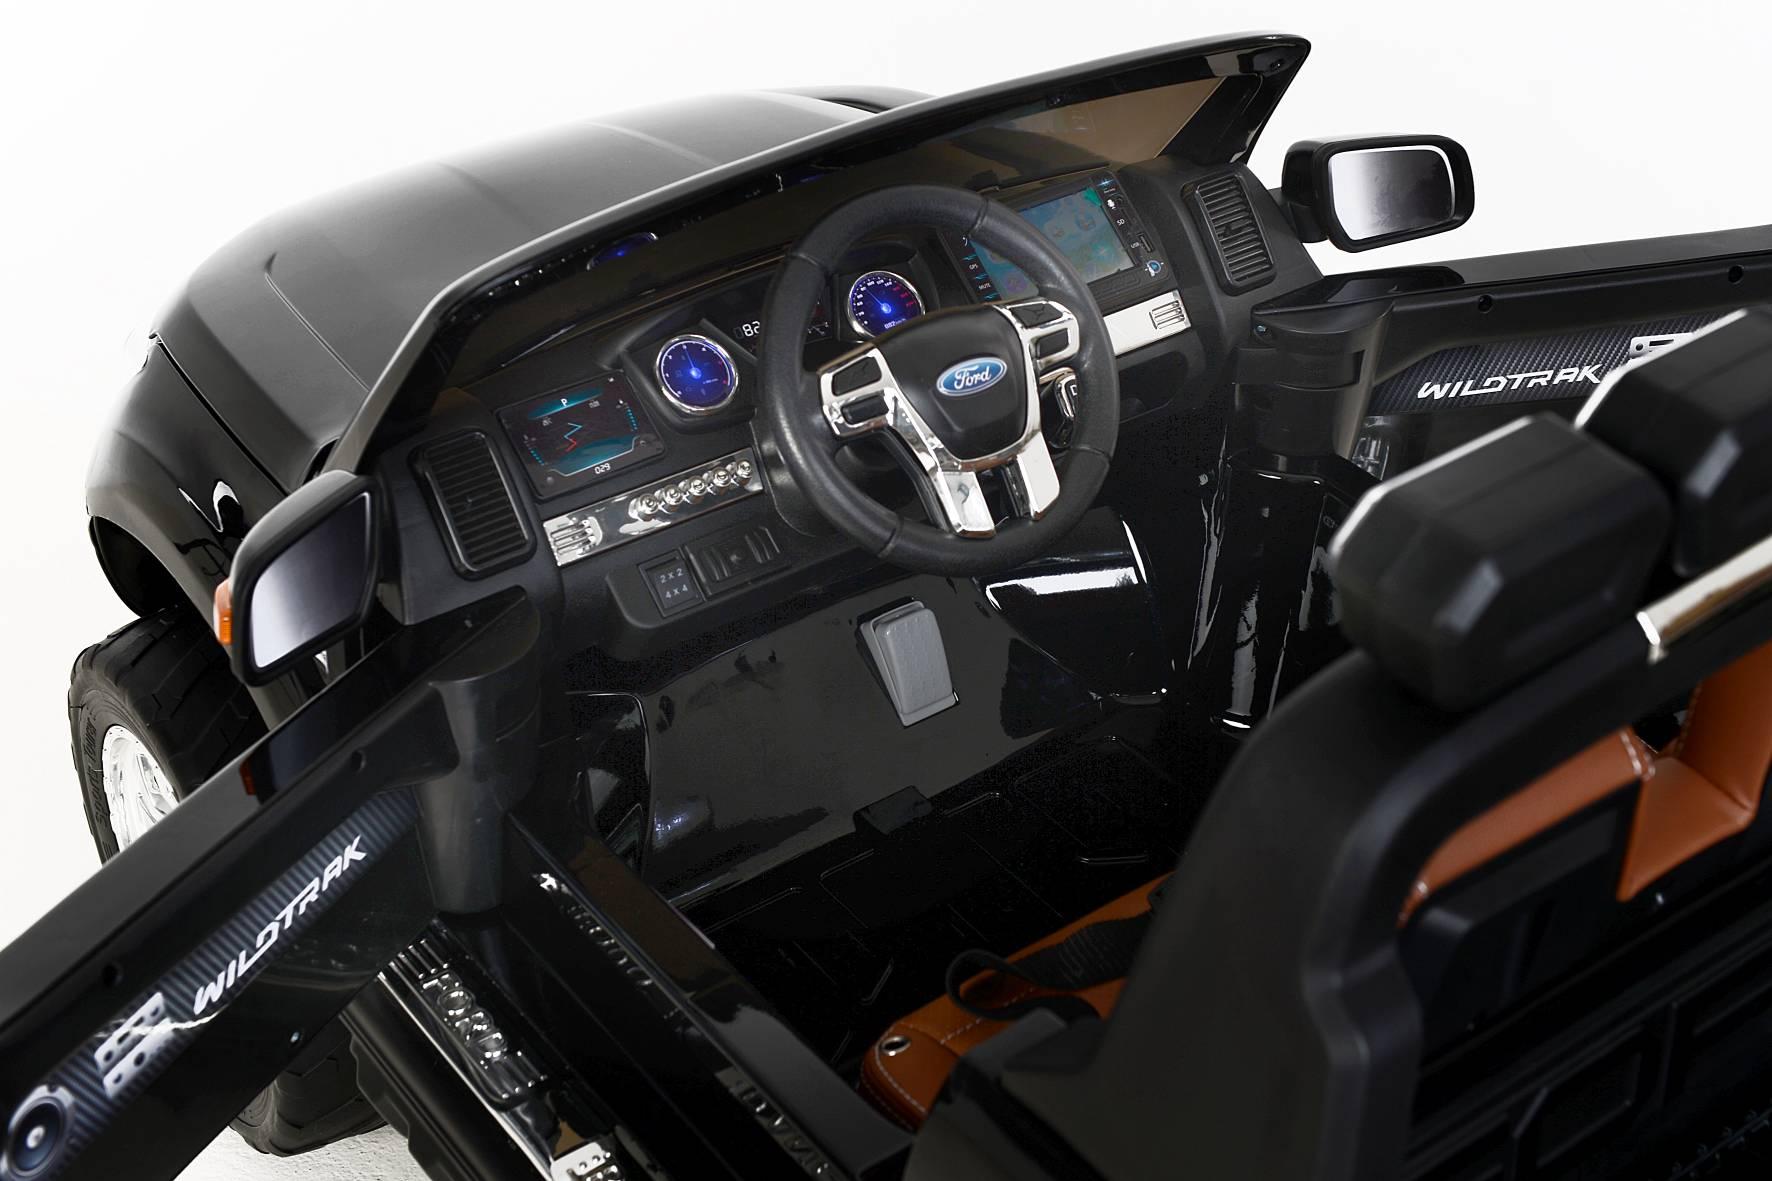 Electric Ride-On Toy Car Ford Ranger Wildtrak 4X4 LCD Luxury, LCD screen, 2.4Ghz, 2x12V, 4 X MOTOR, remote control, two-seats in leather, Soft EVA wheels, FM Radio, Bluetooth, Black